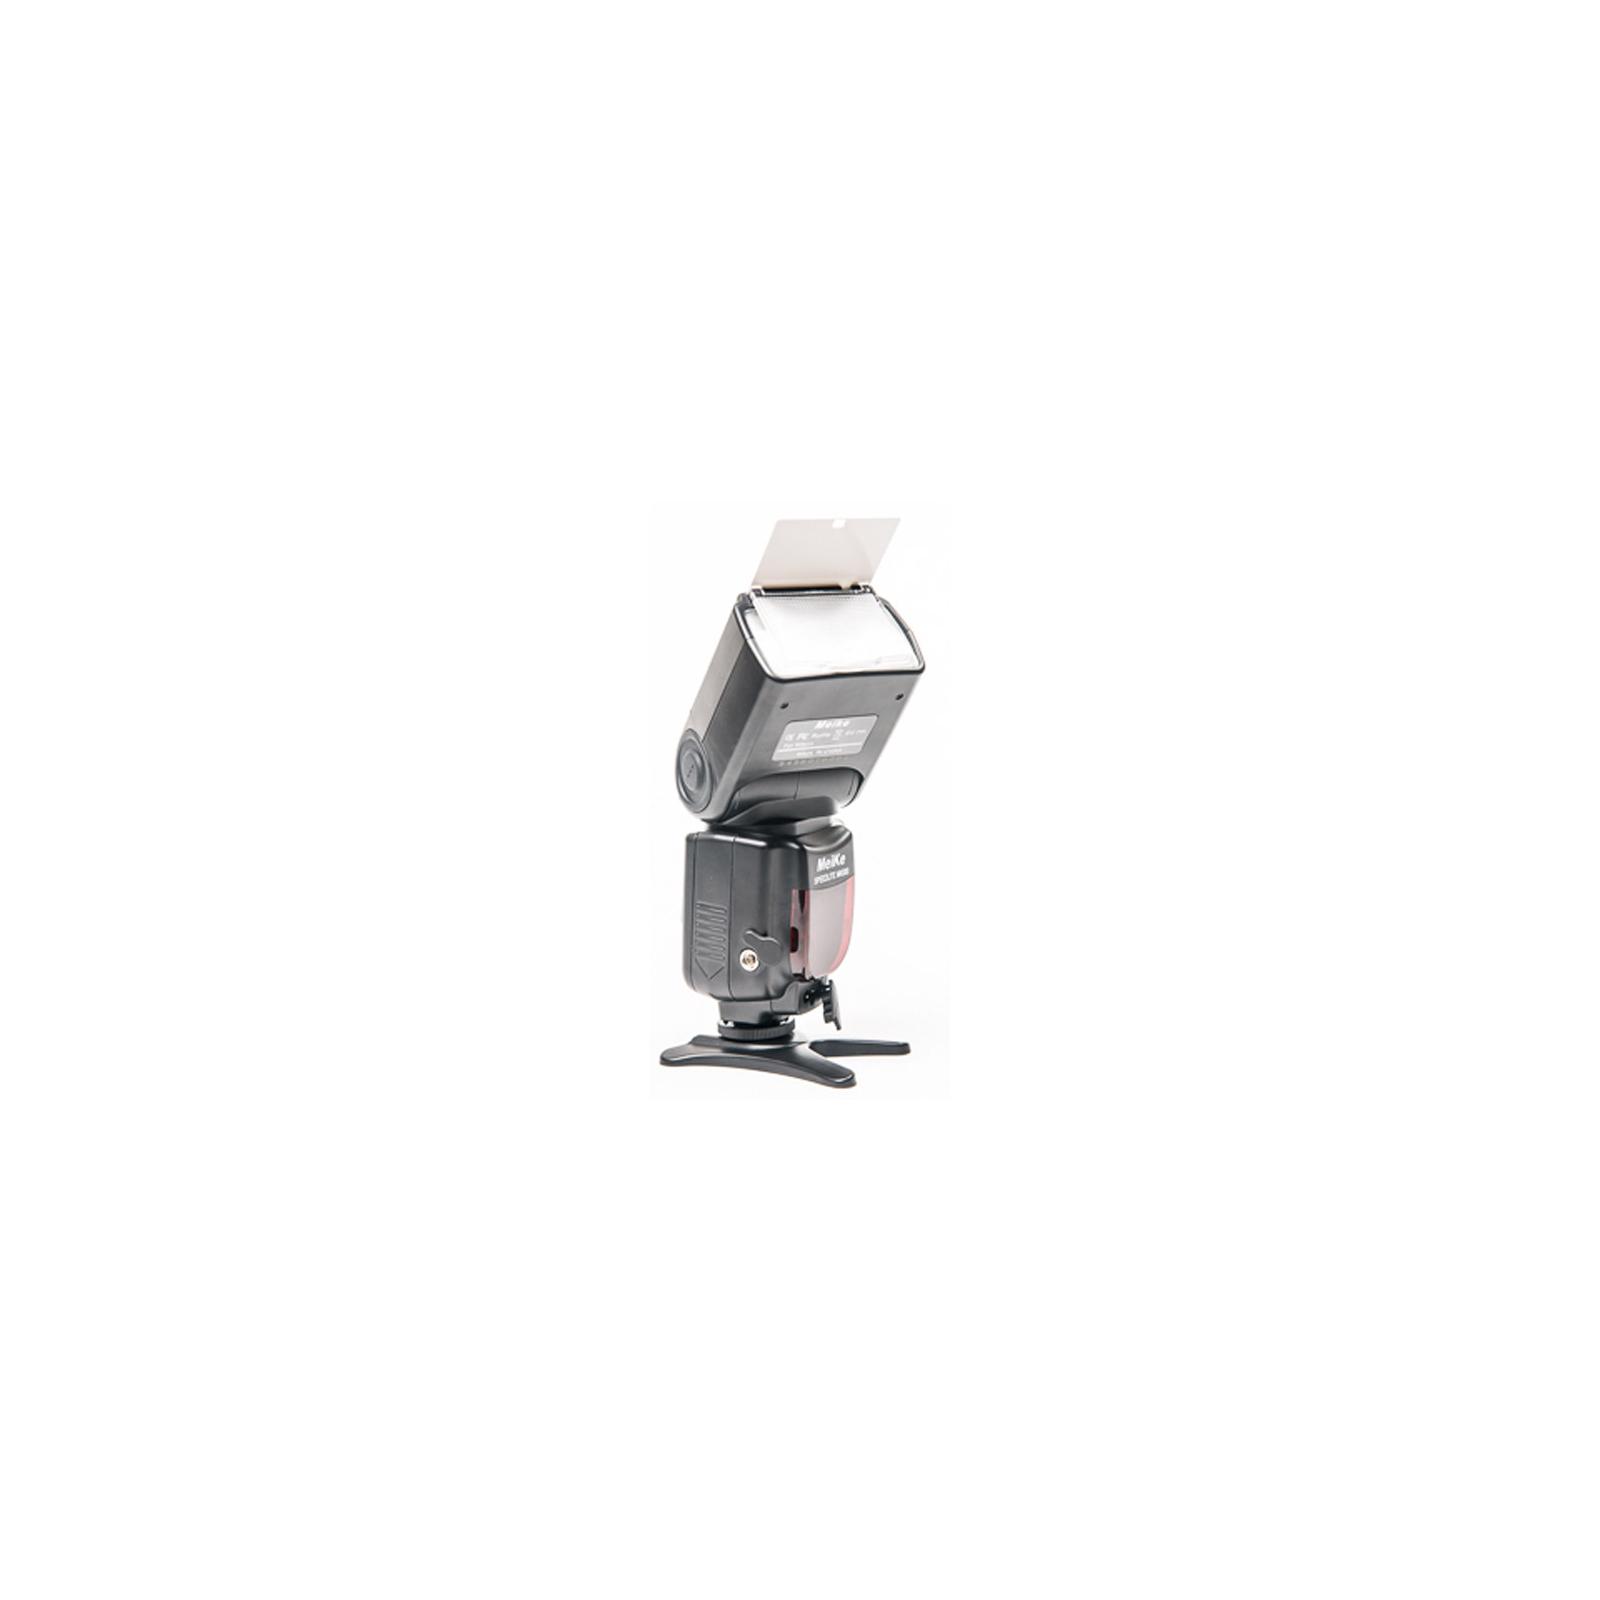 Вспышка Meike Nikon 430n (SKW430N) изображение 2